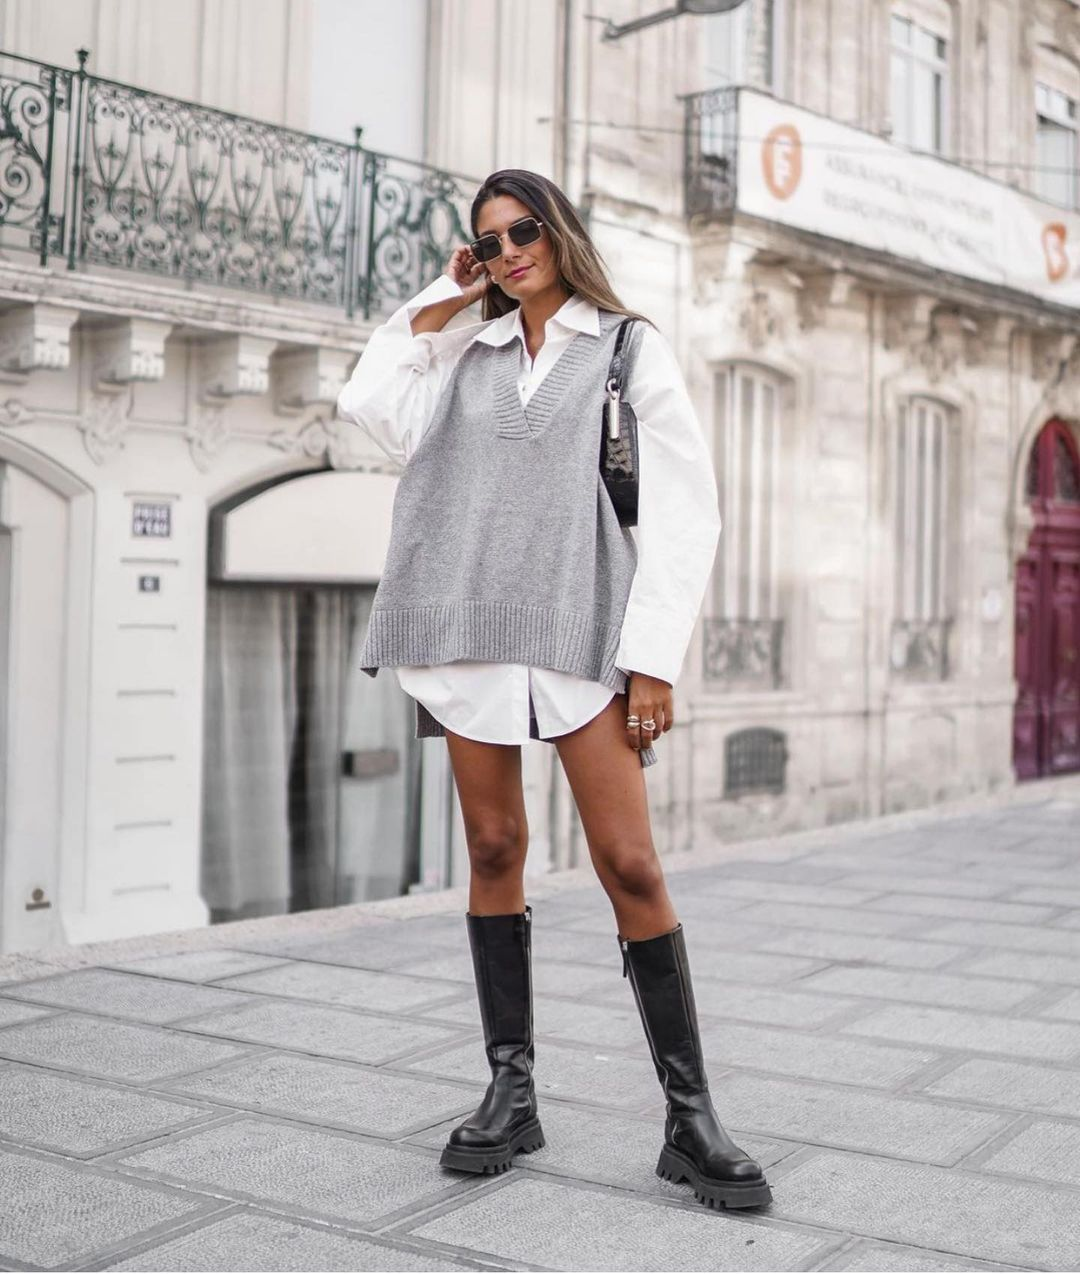 bottes en cuir semelle track de Zara sur zara.outfits